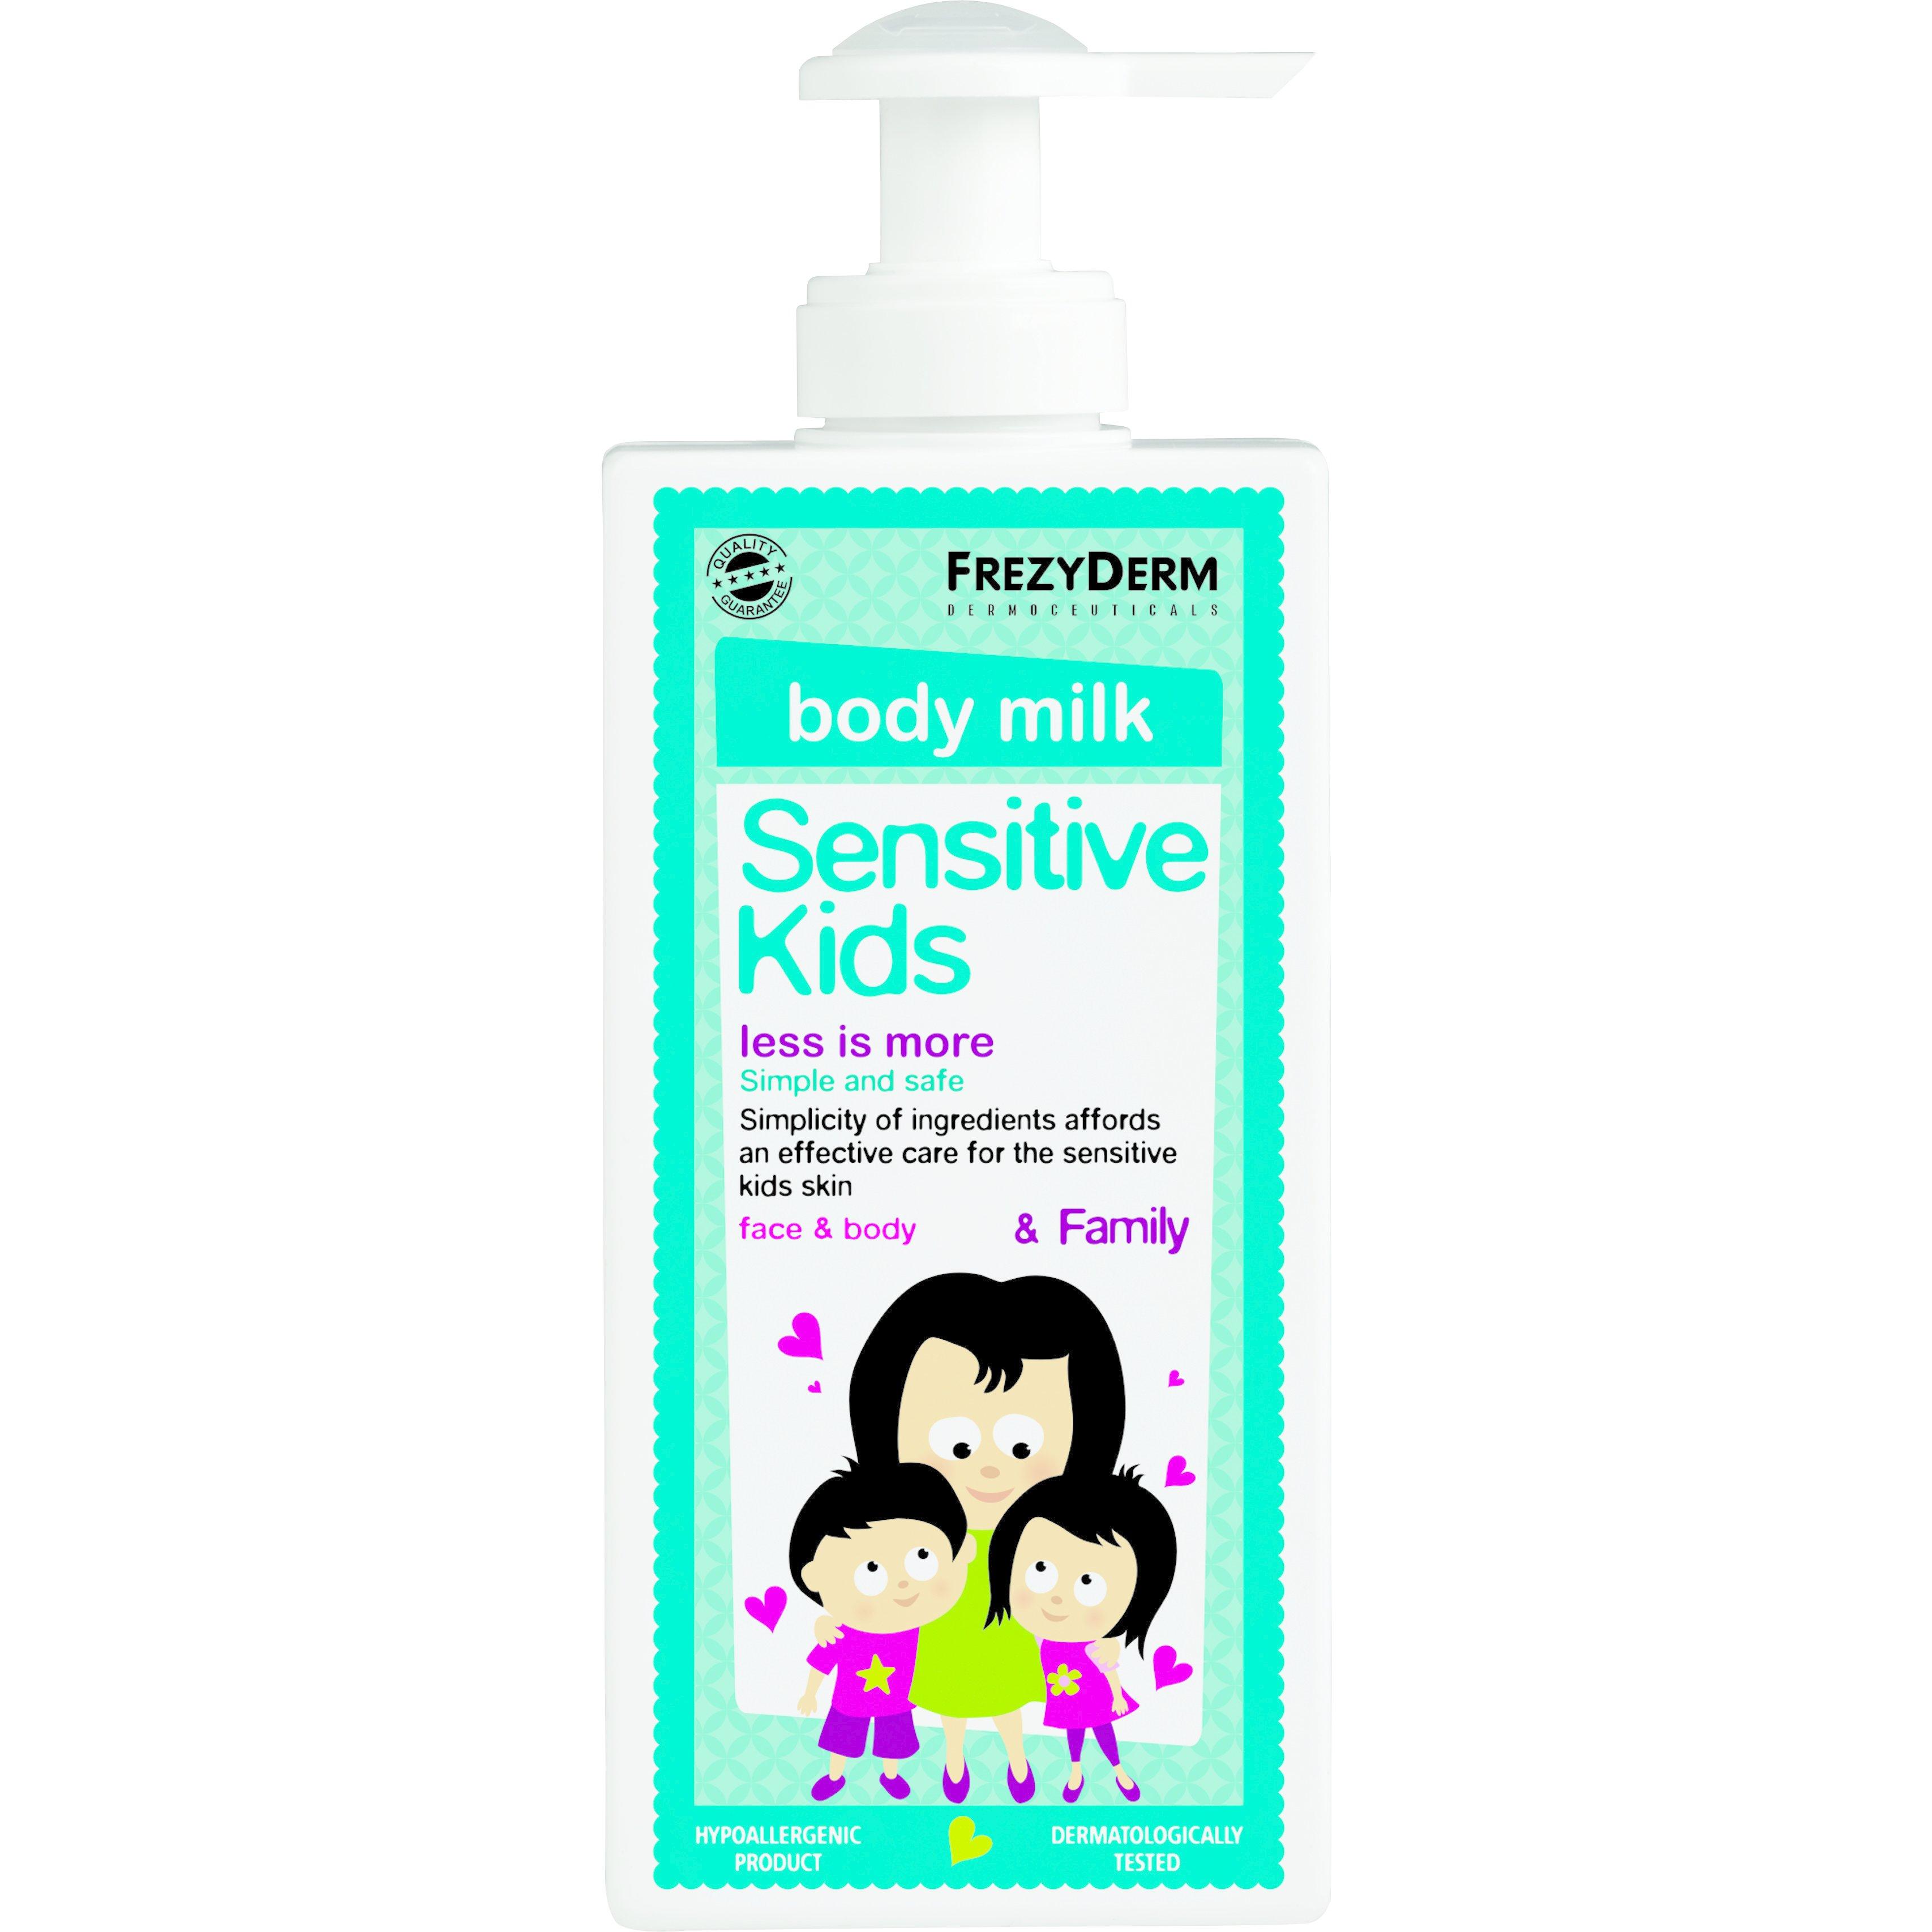 Frezyderm Sensitive Kids Face & Body Milk Απαλό Ενυδατικό Γαλάκτωμα για την Παιδική Επιδερμίδα 200ml